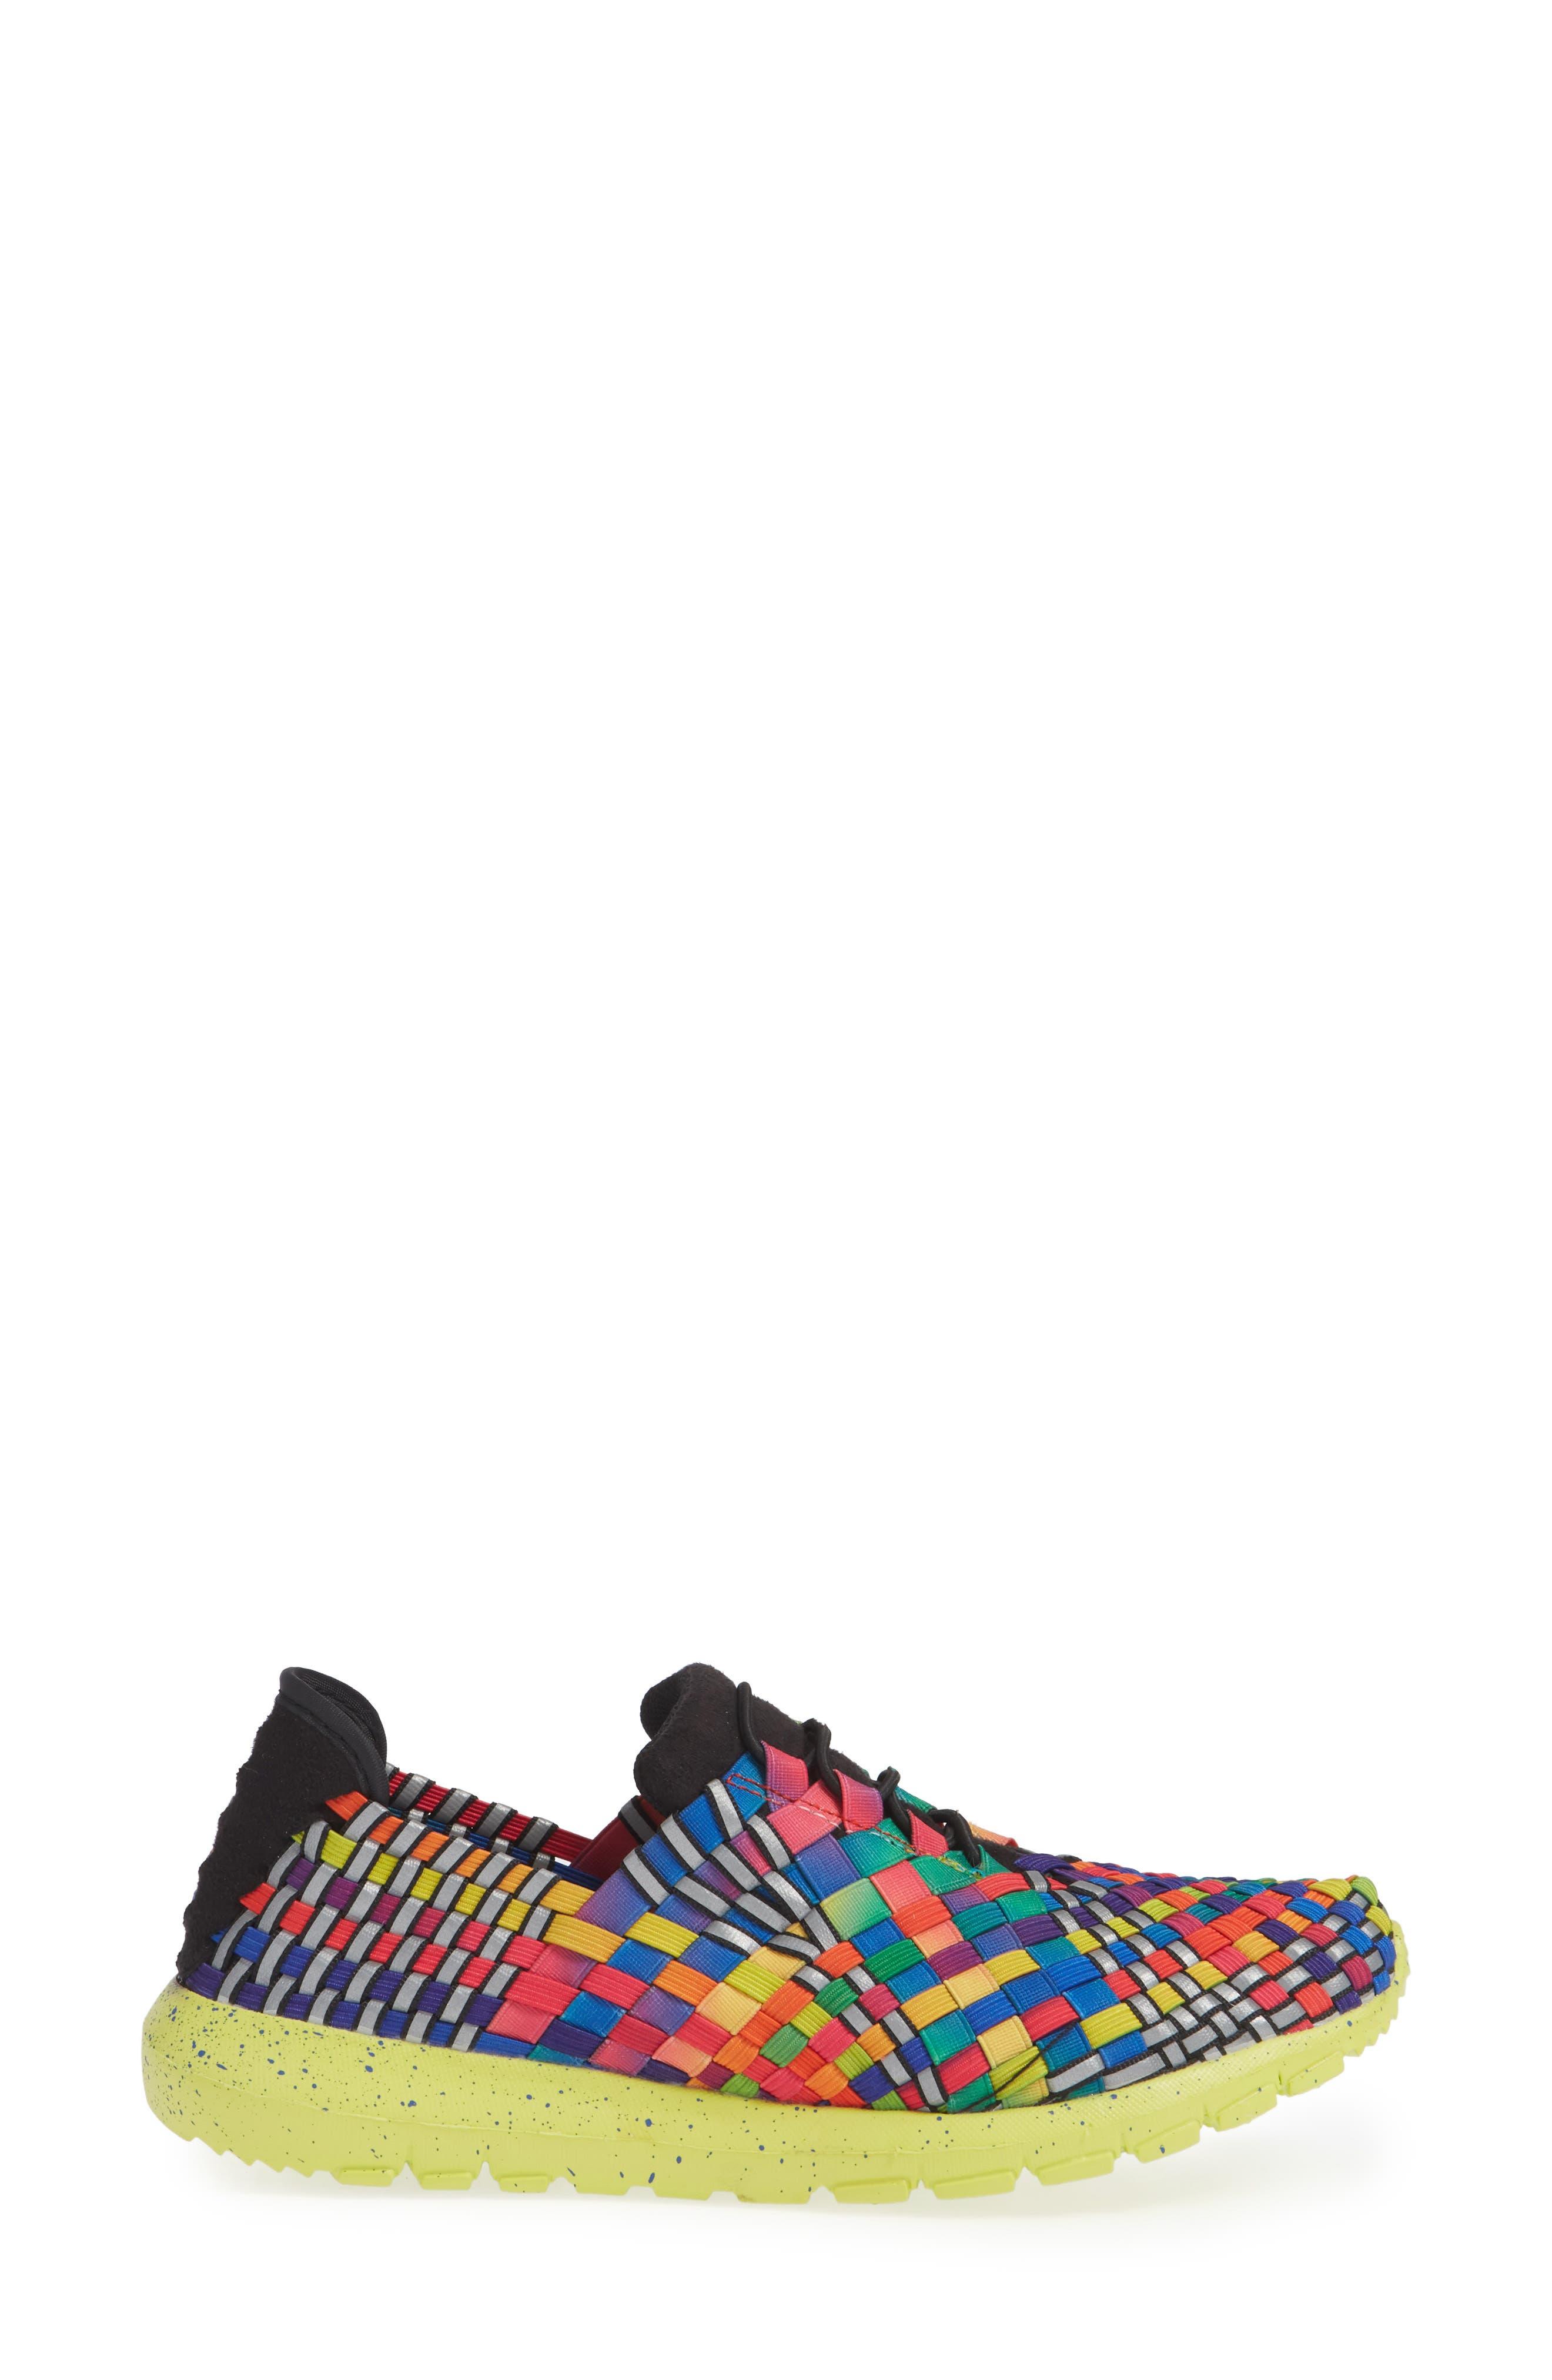 Runners Victoria Sneaker,                             Alternate thumbnail 3, color,                             Black Multi Reflective Fabric